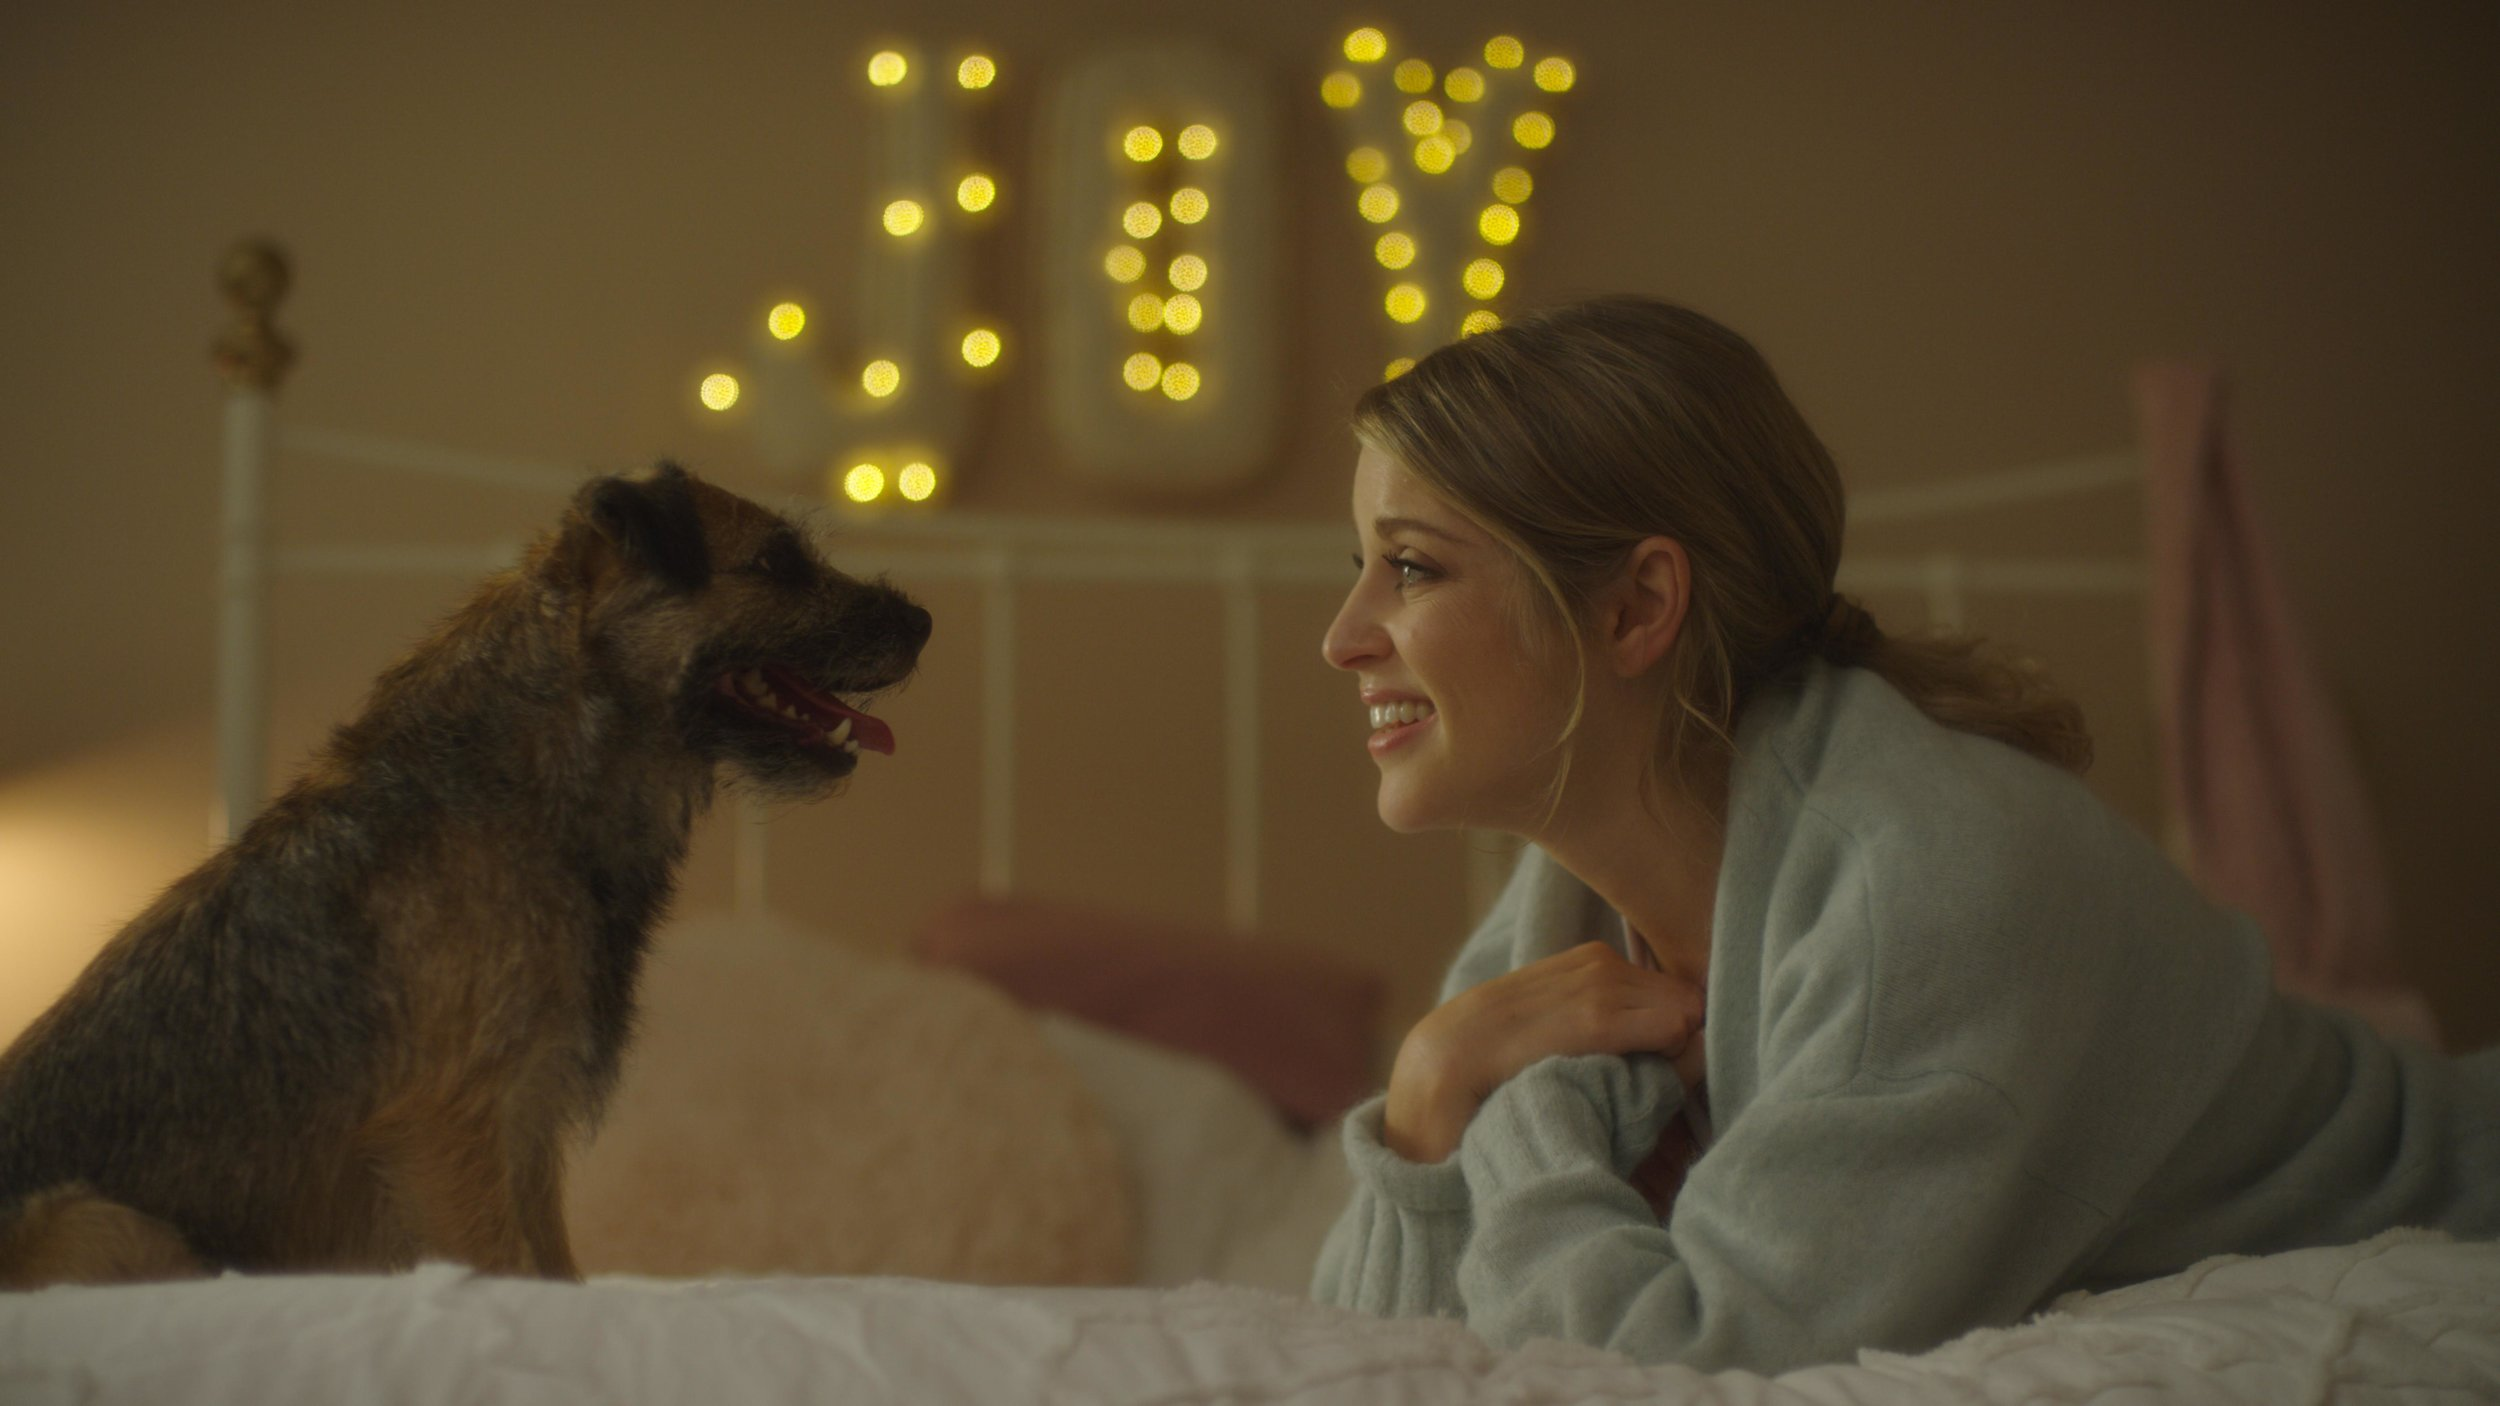 Amy Huberman as Joy, with Canine Aidan, in Finding Joy (2018)